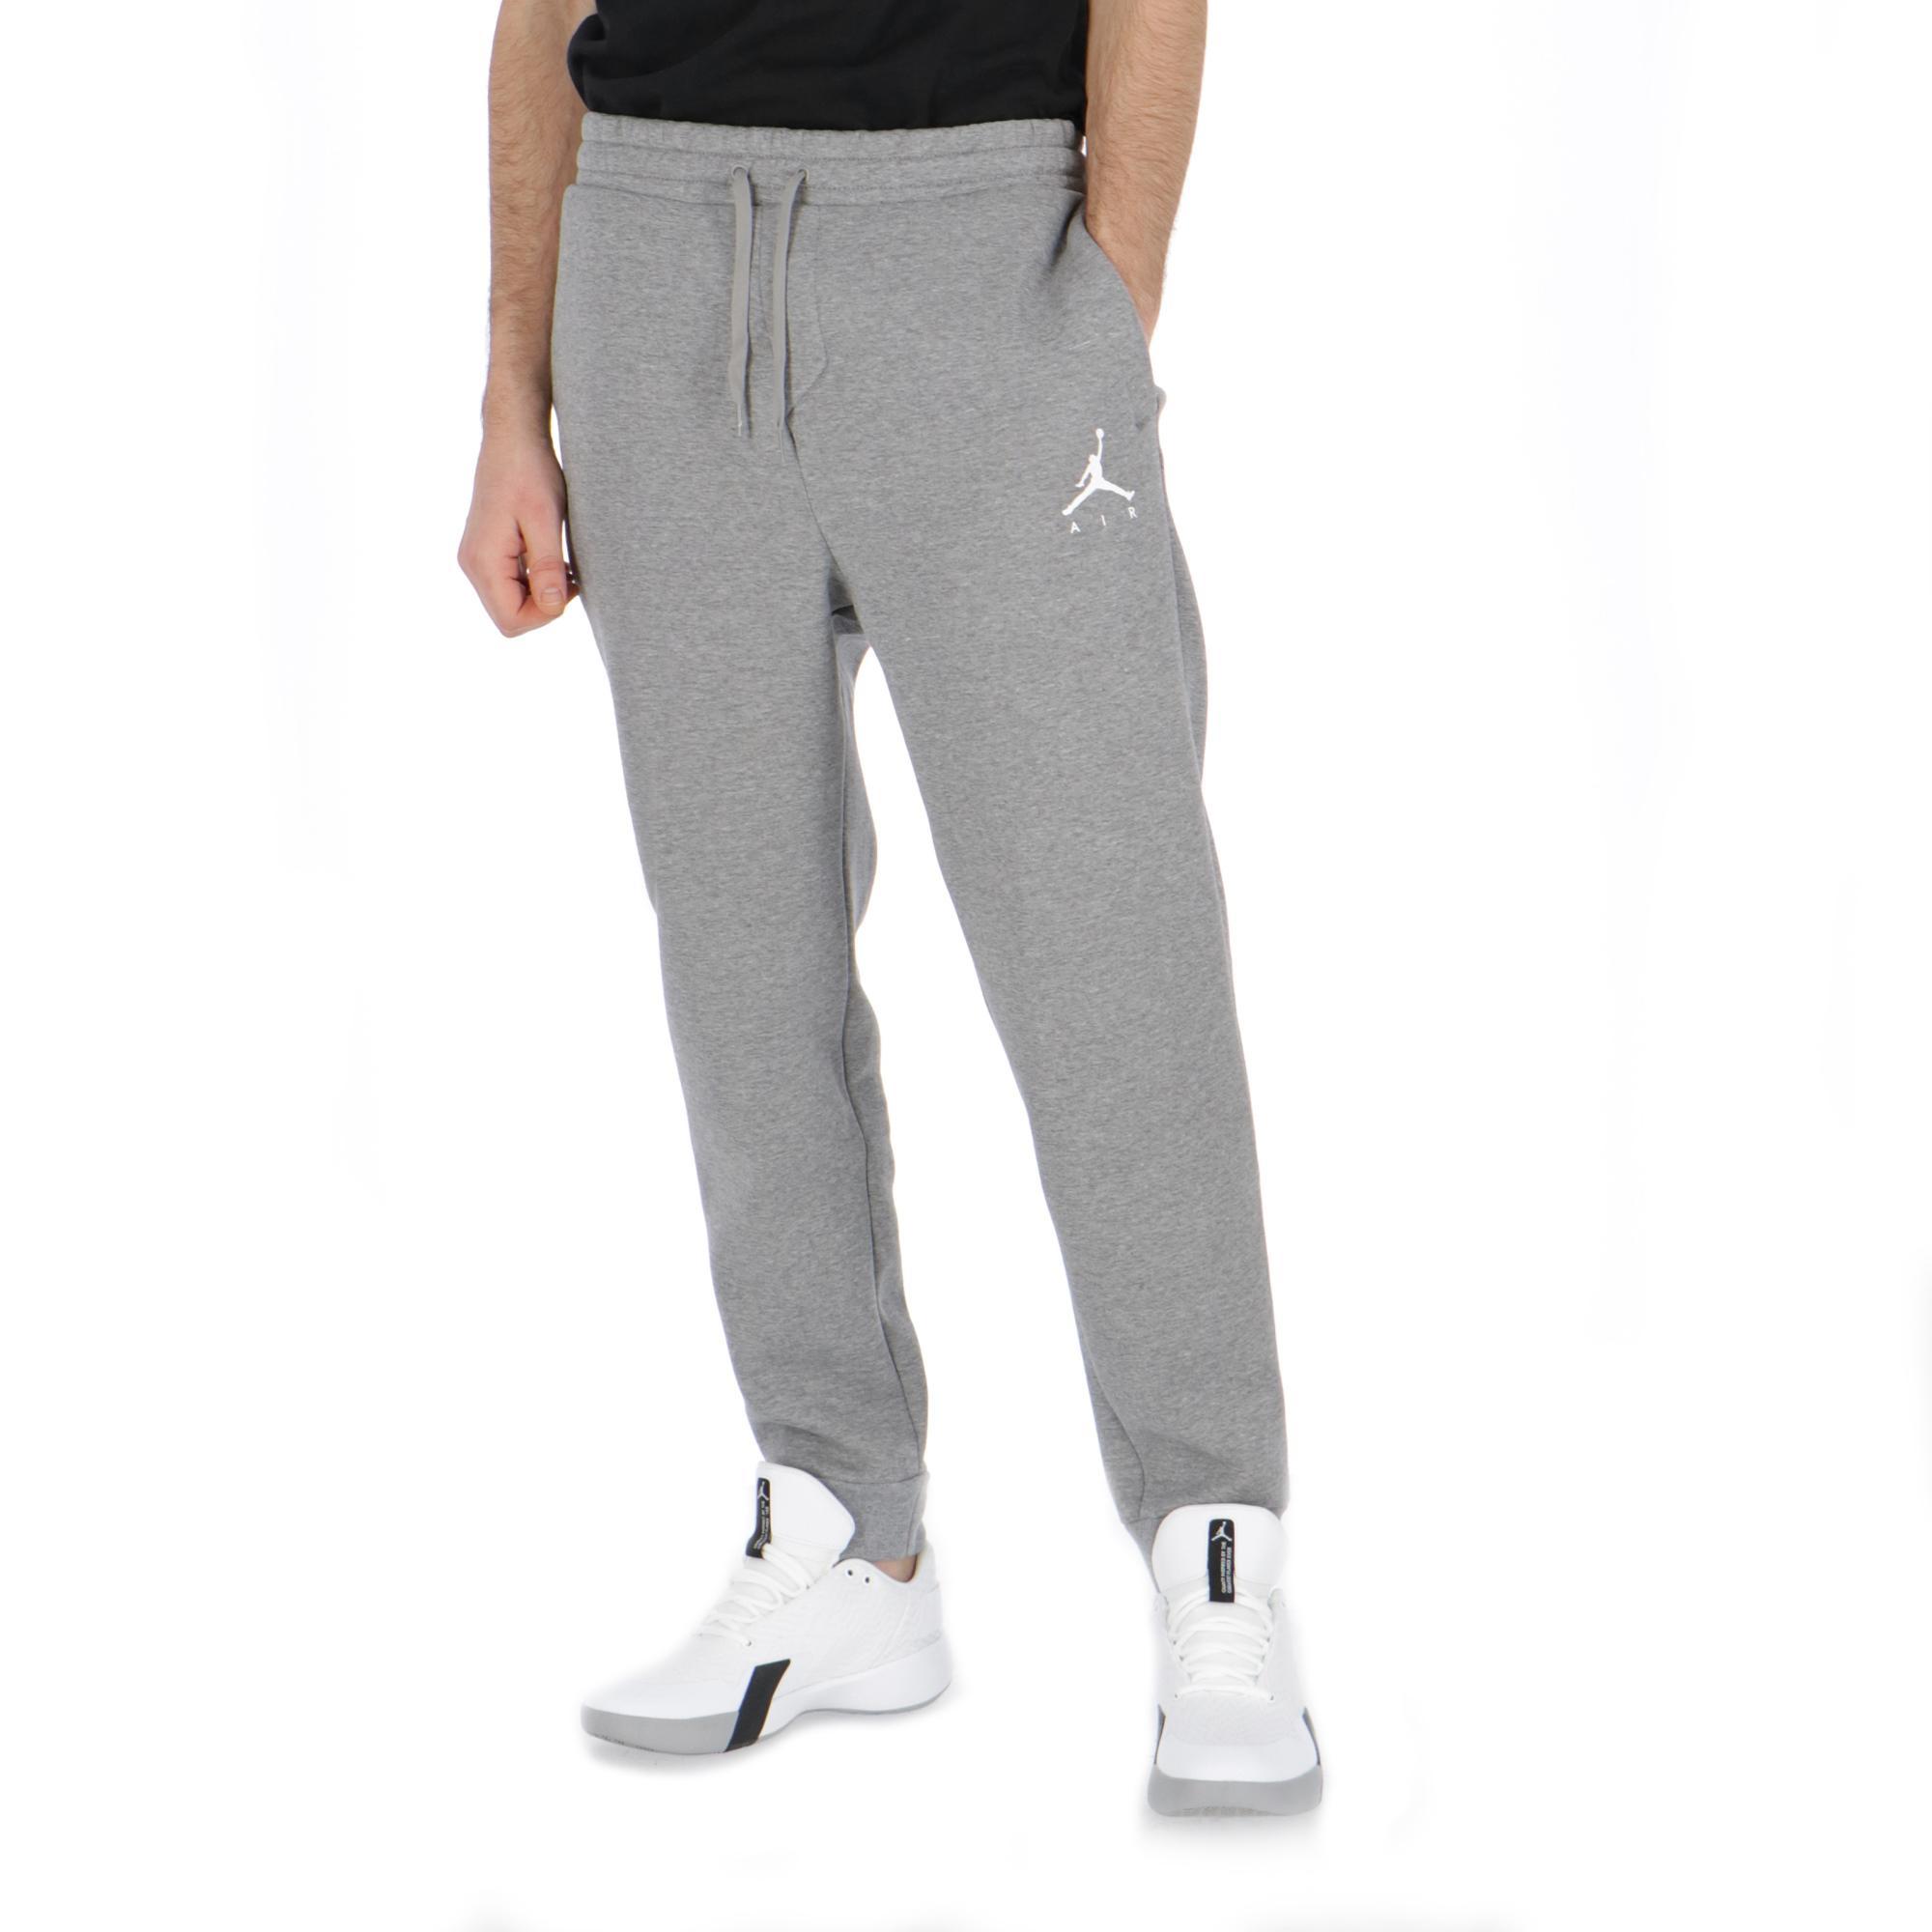 5923af07eaef98 Jordan Jumpman Fleece Pant Carbon Heather white